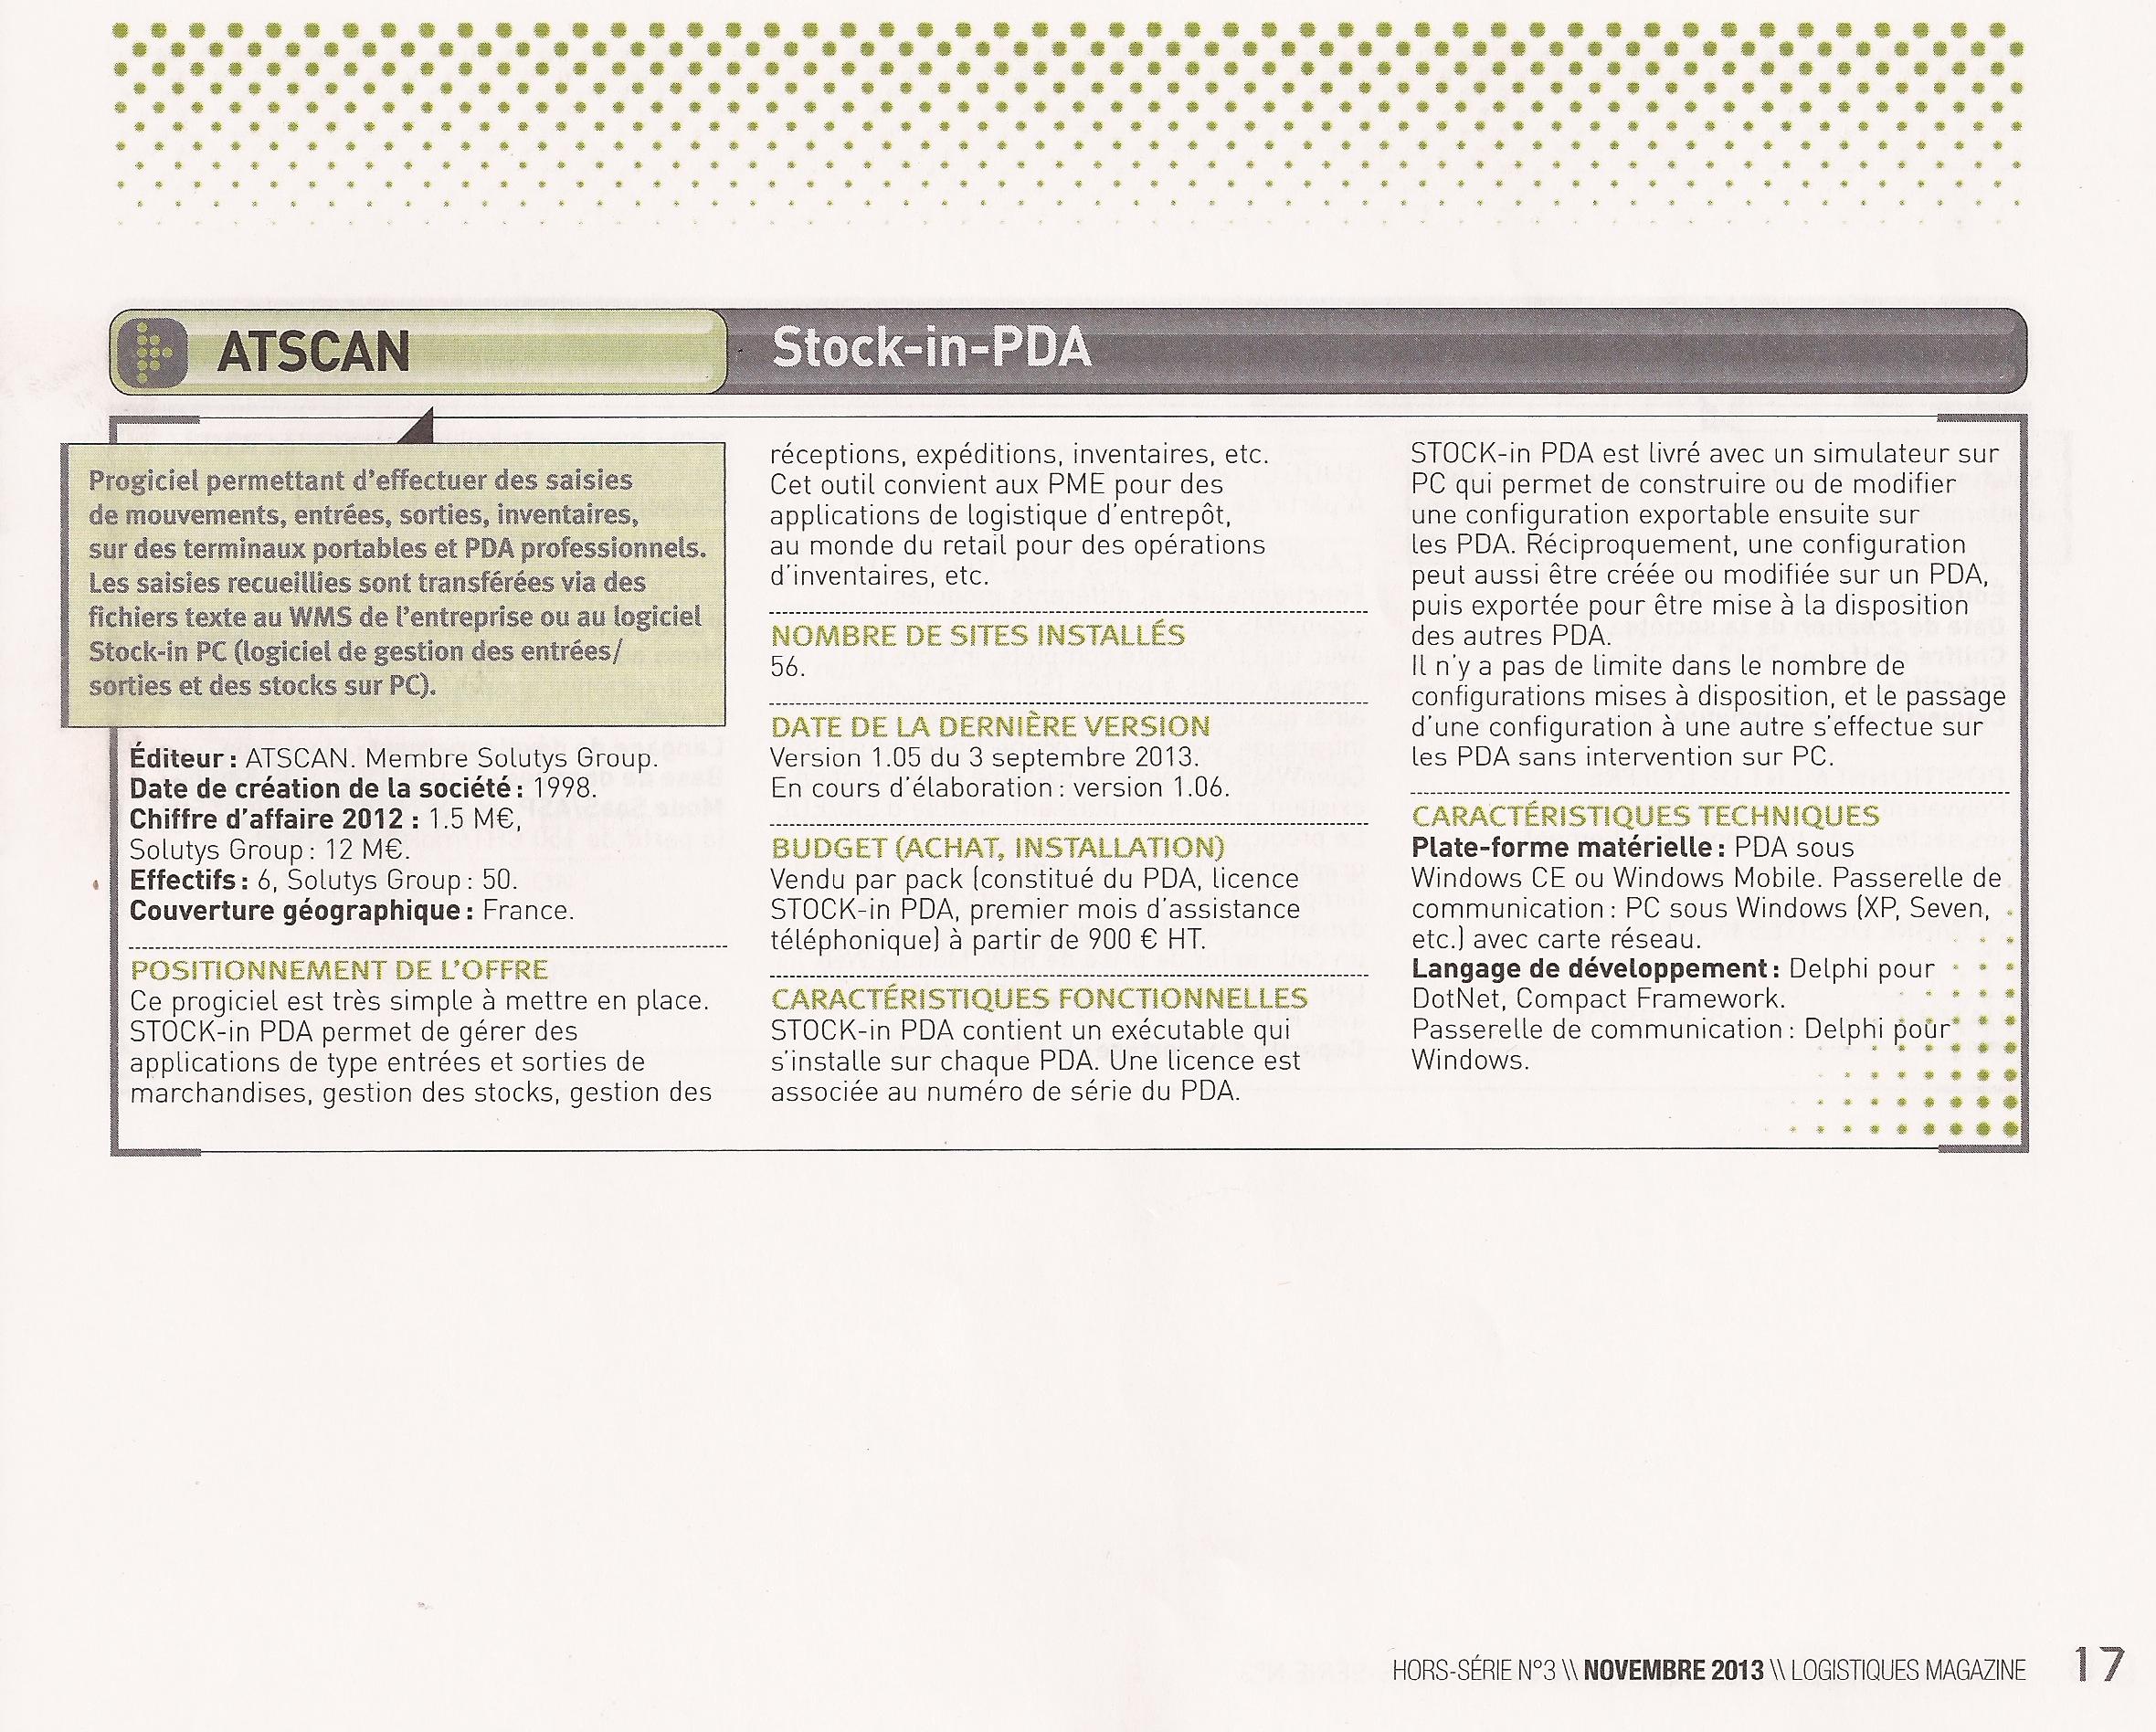 Logiciel Stock-in-PDA- Gestion de Stock - Atscan